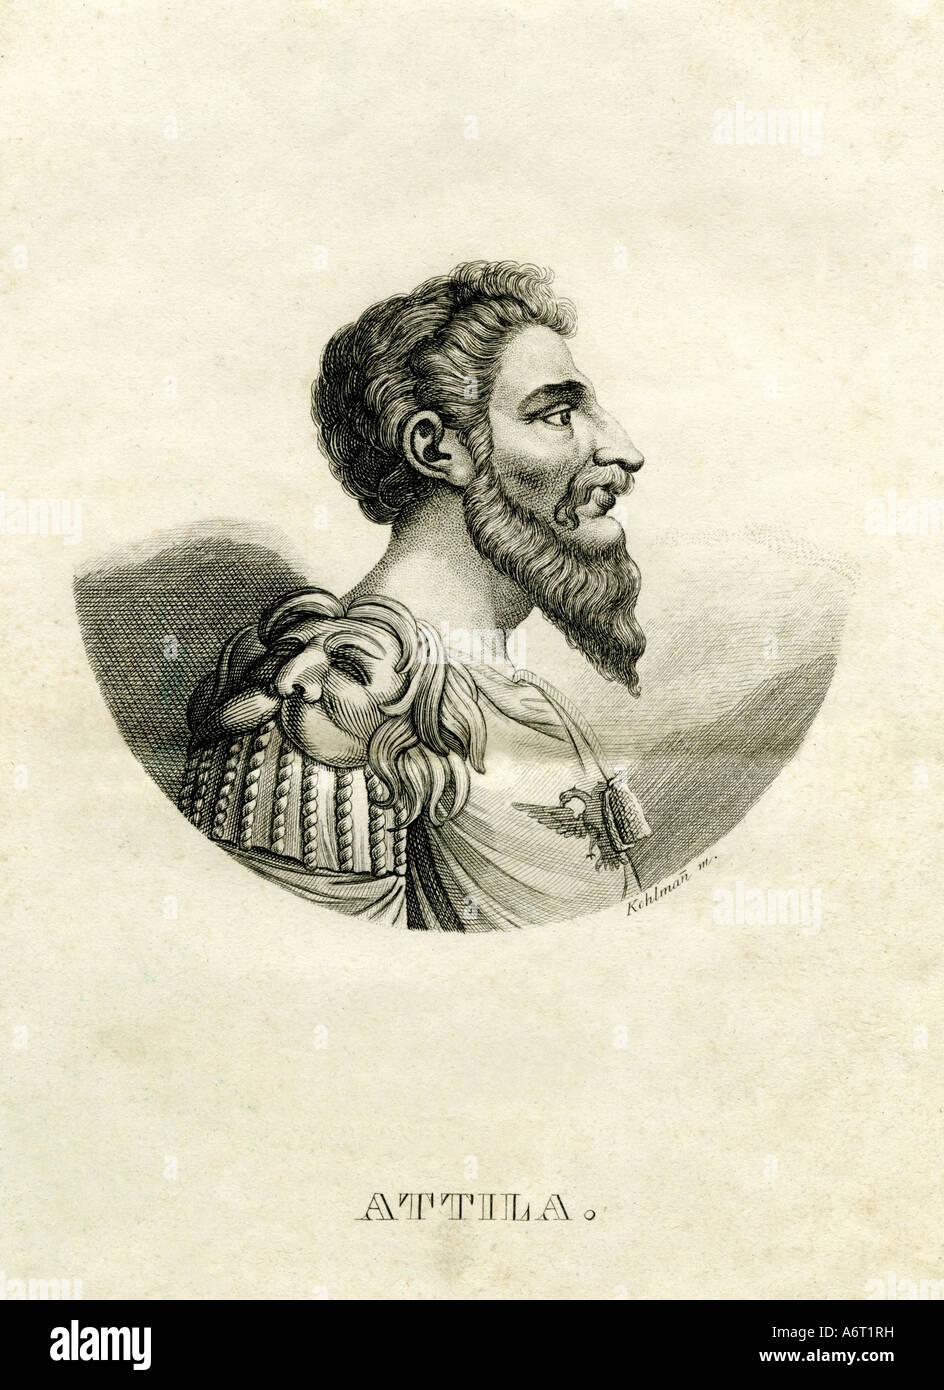 Attila the Hun, circa 406 - 453, King of the Huns, circa 433 - 453, portrait, steel engraving, by Kohlmann, 1836, - Stock Image